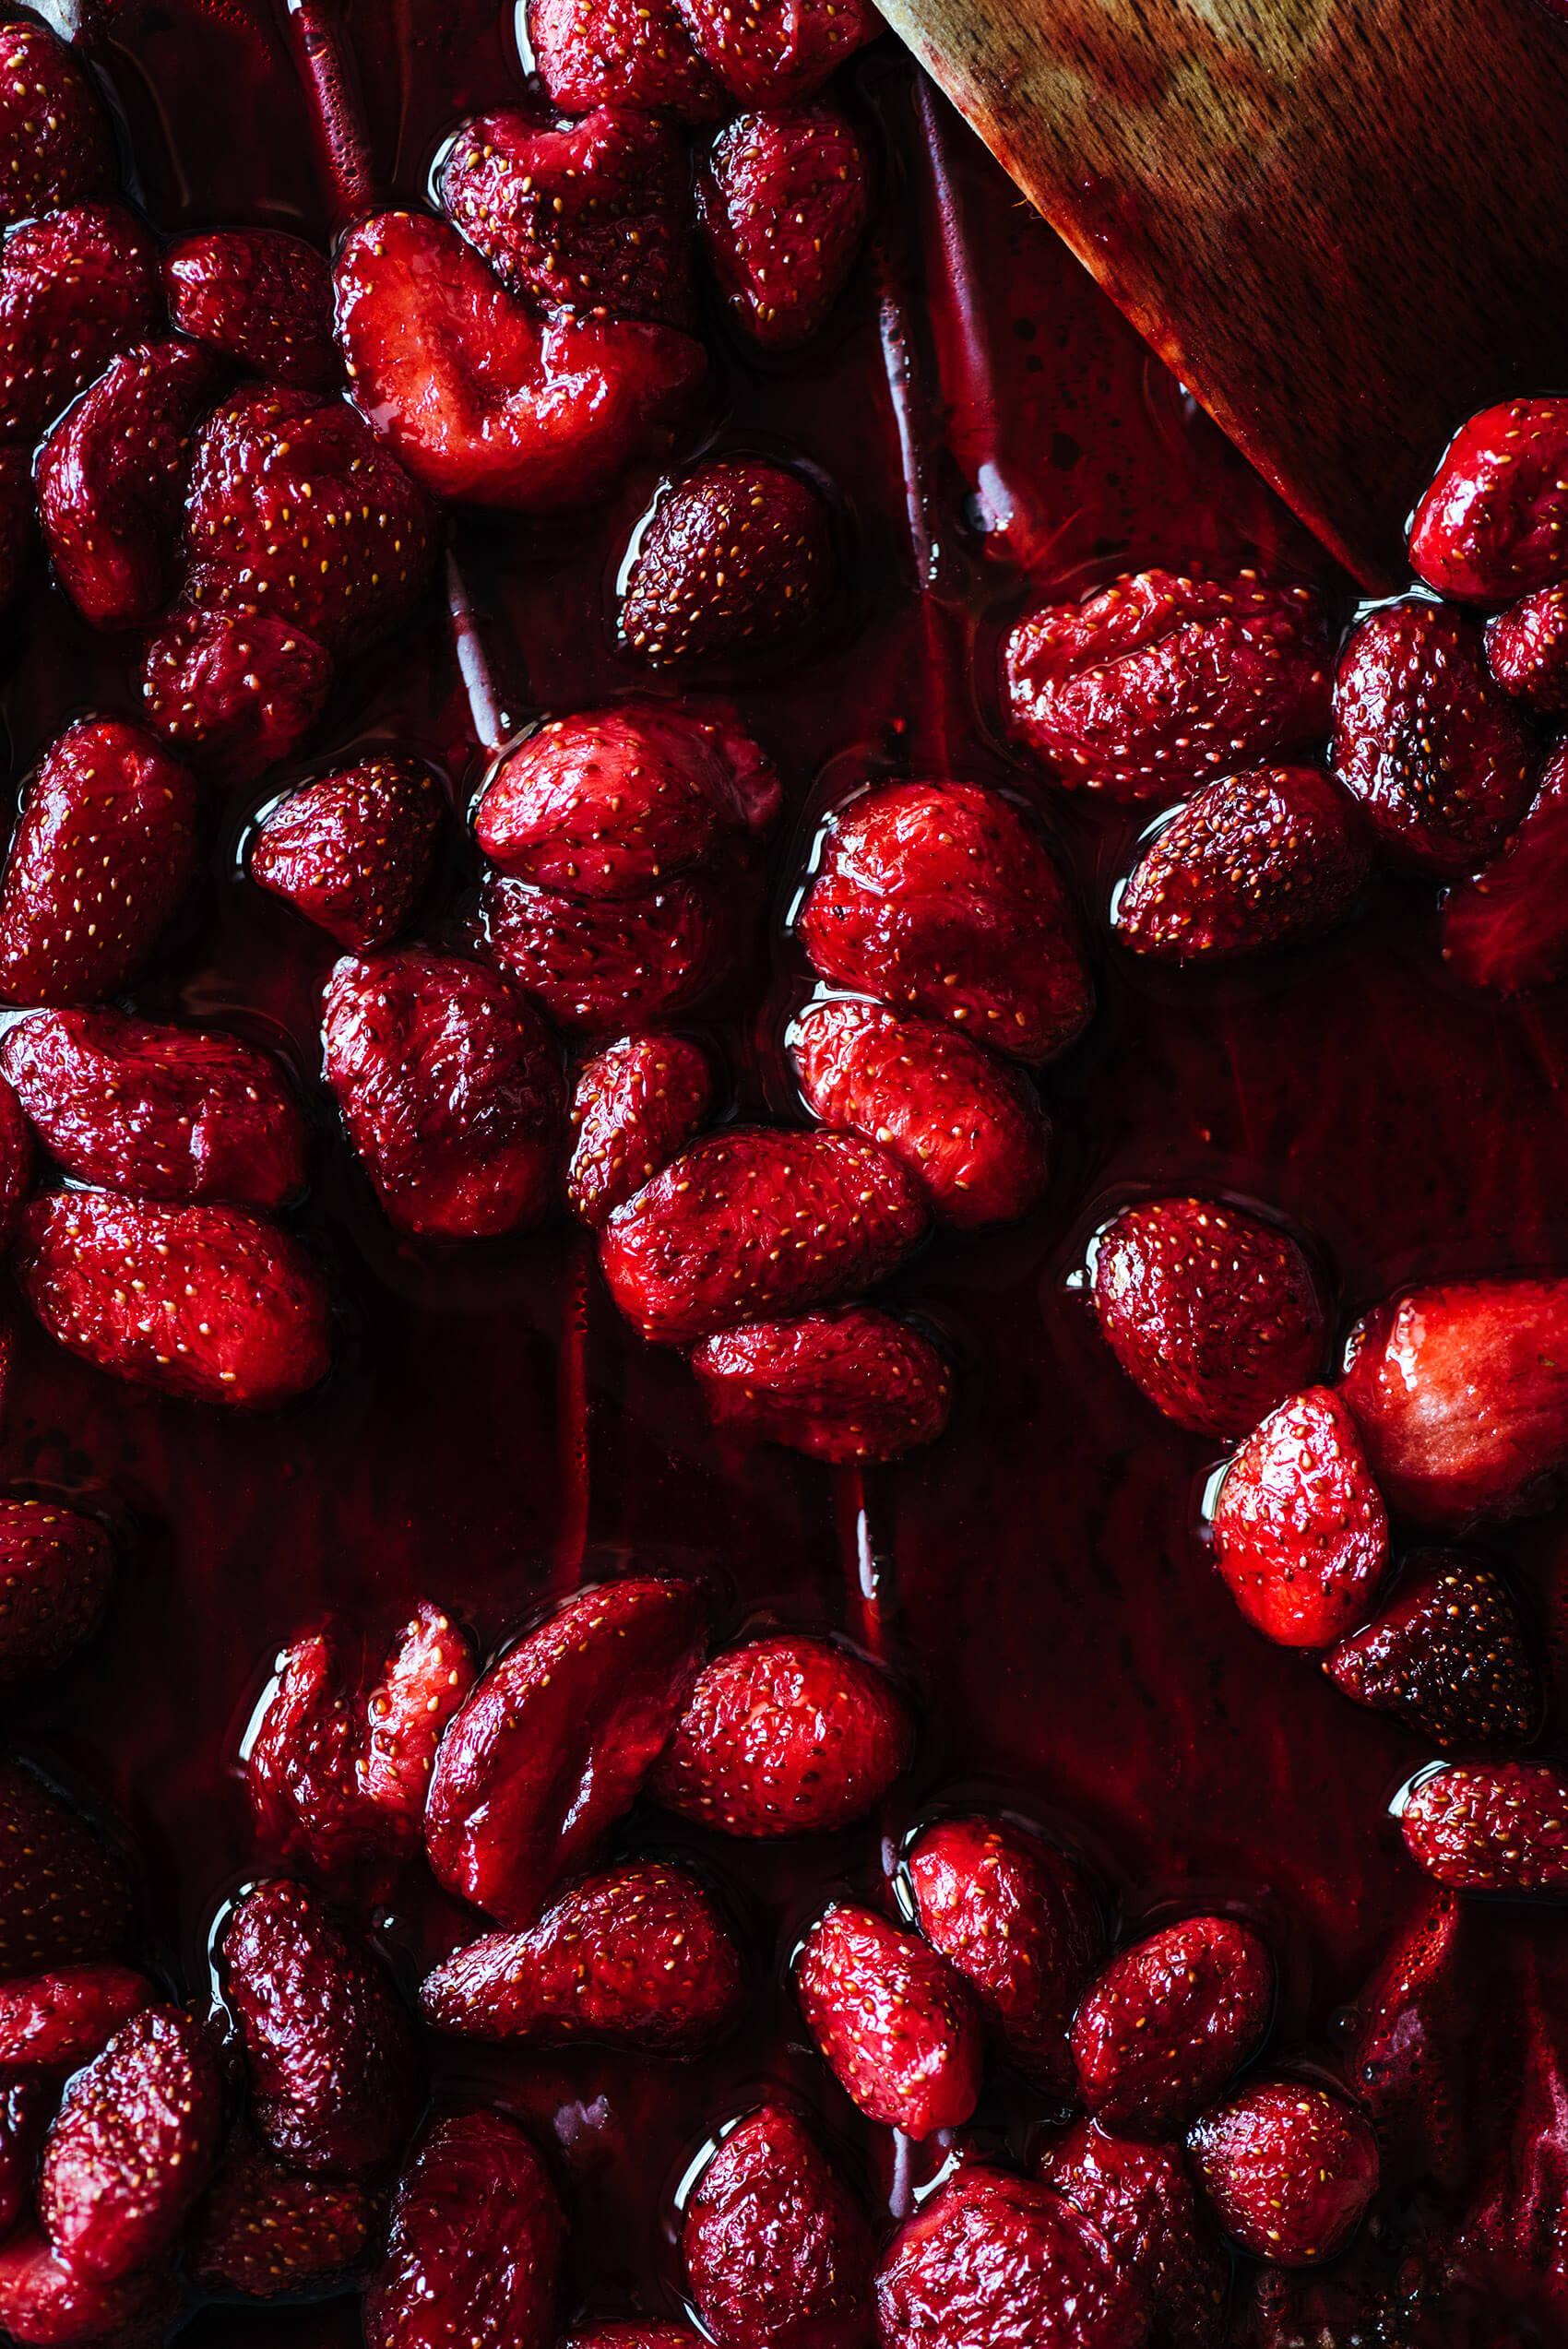 Glaces fraises rôties, yaourt & miel - Lilie Bakery